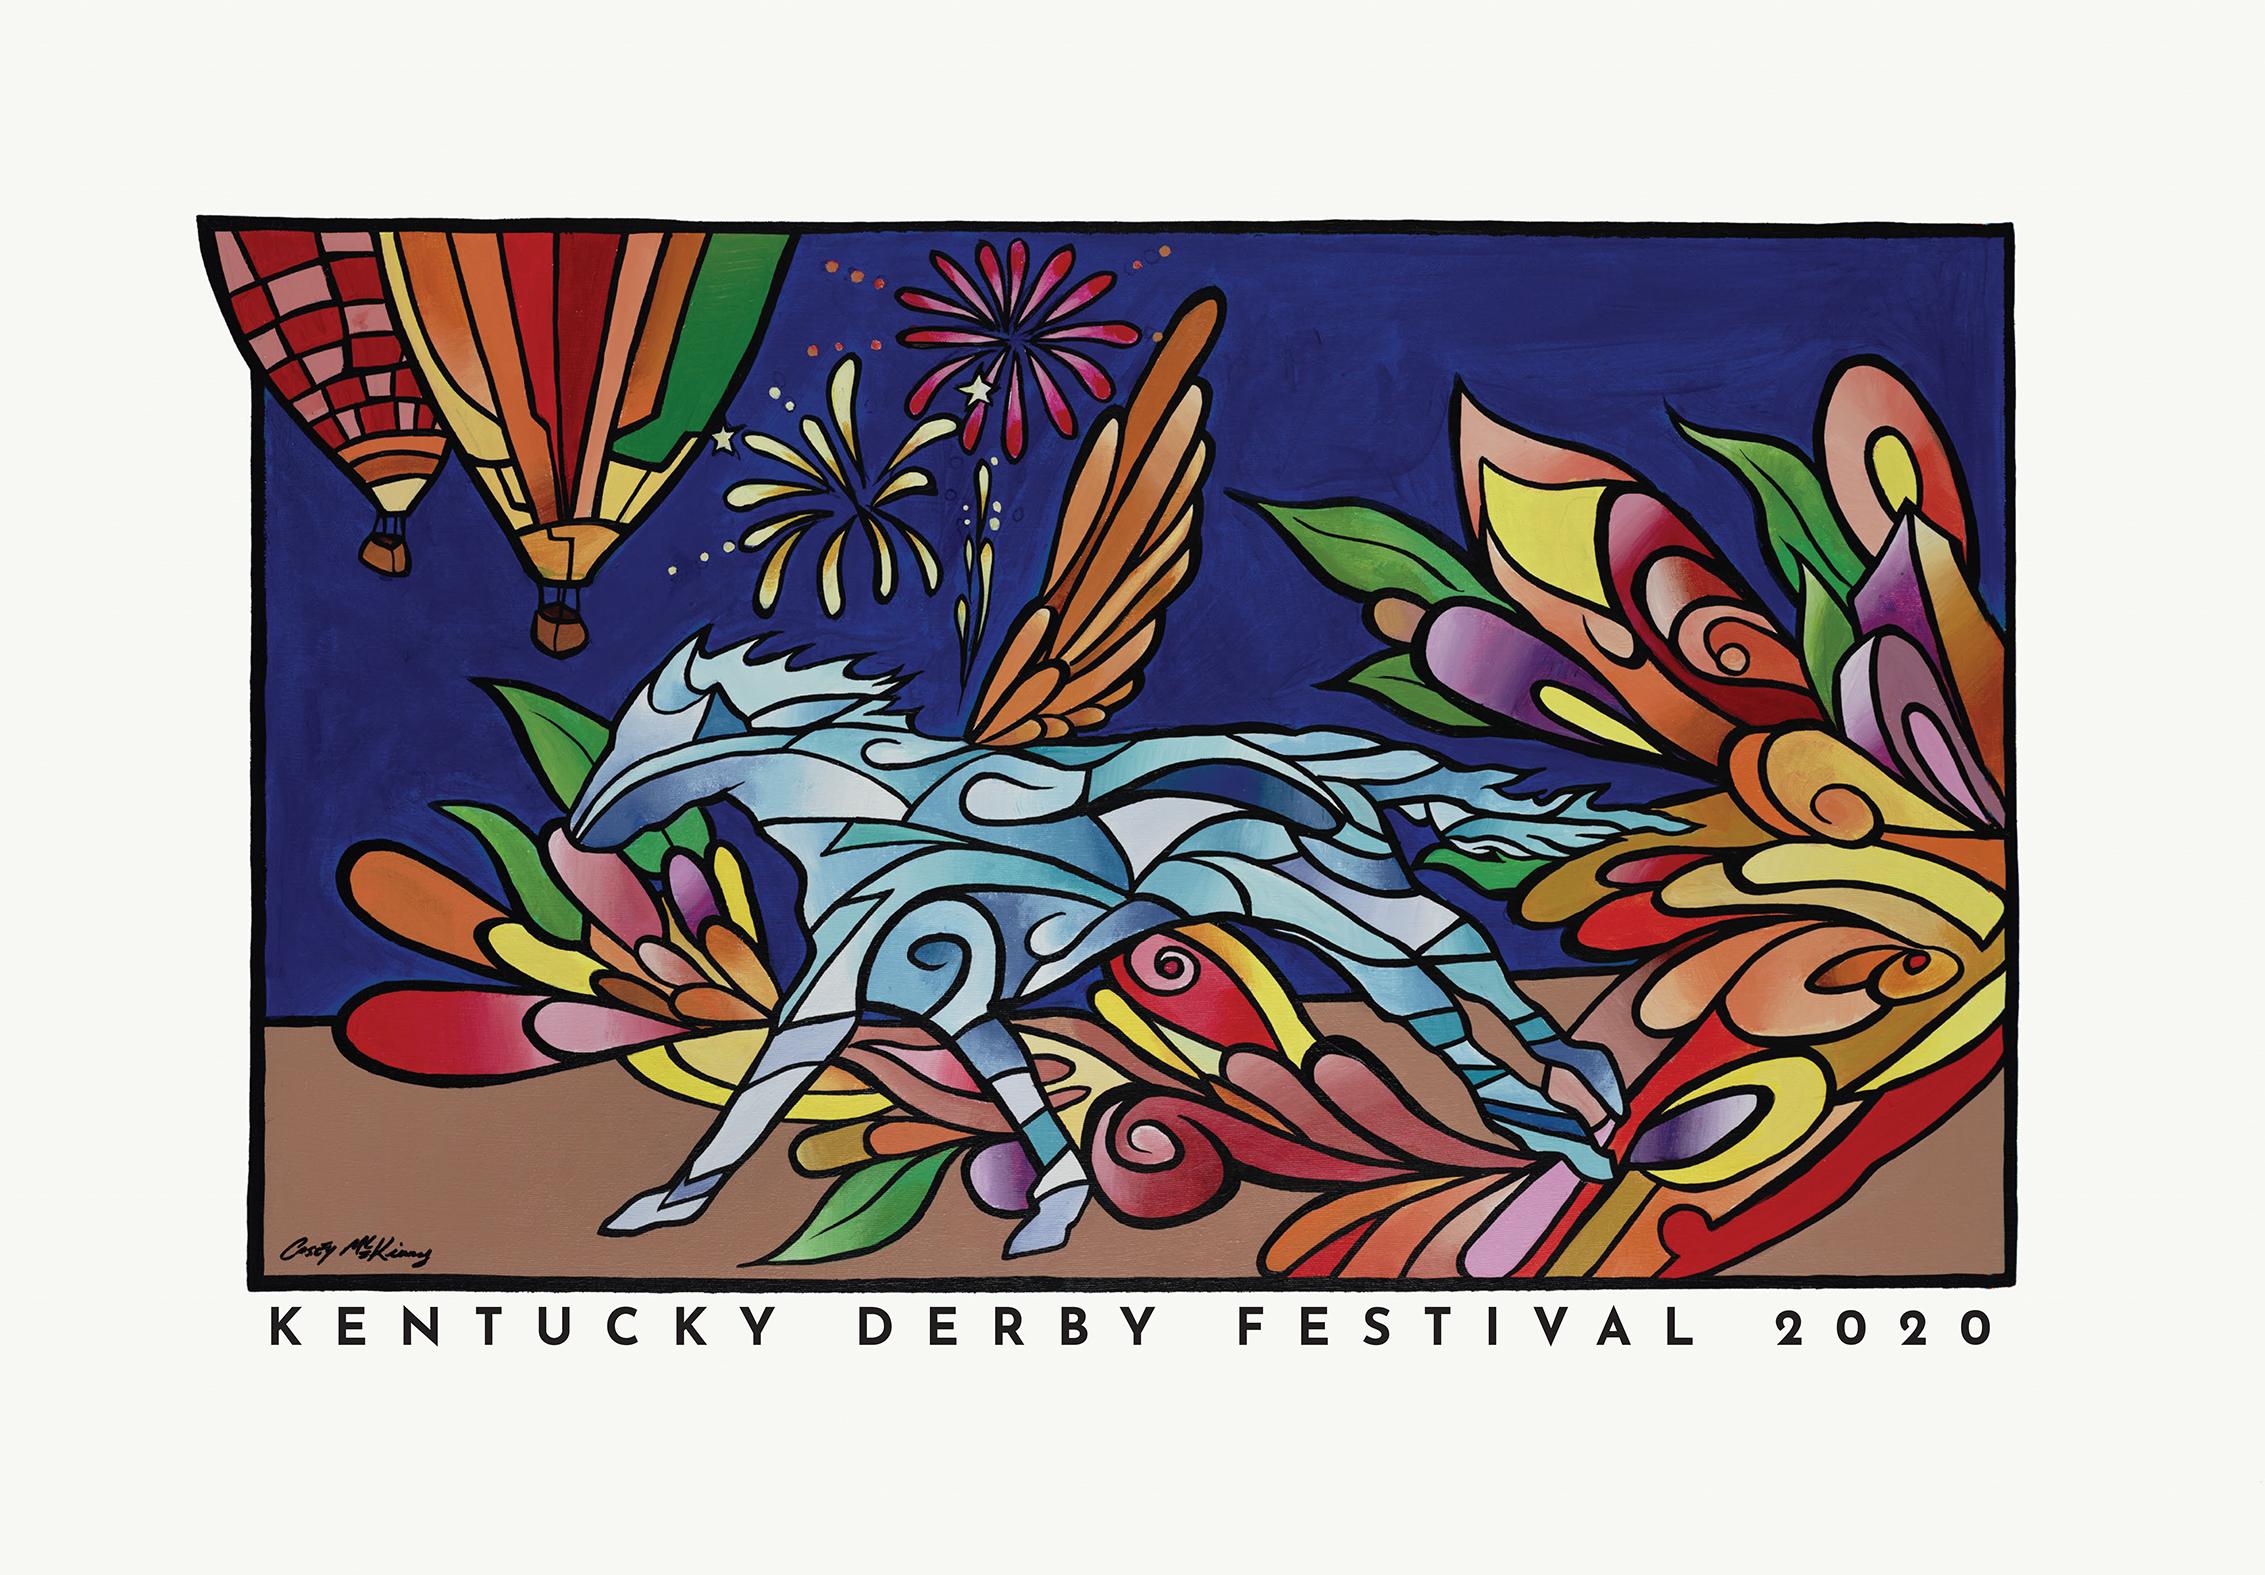 2020 kentucky derby festival poster